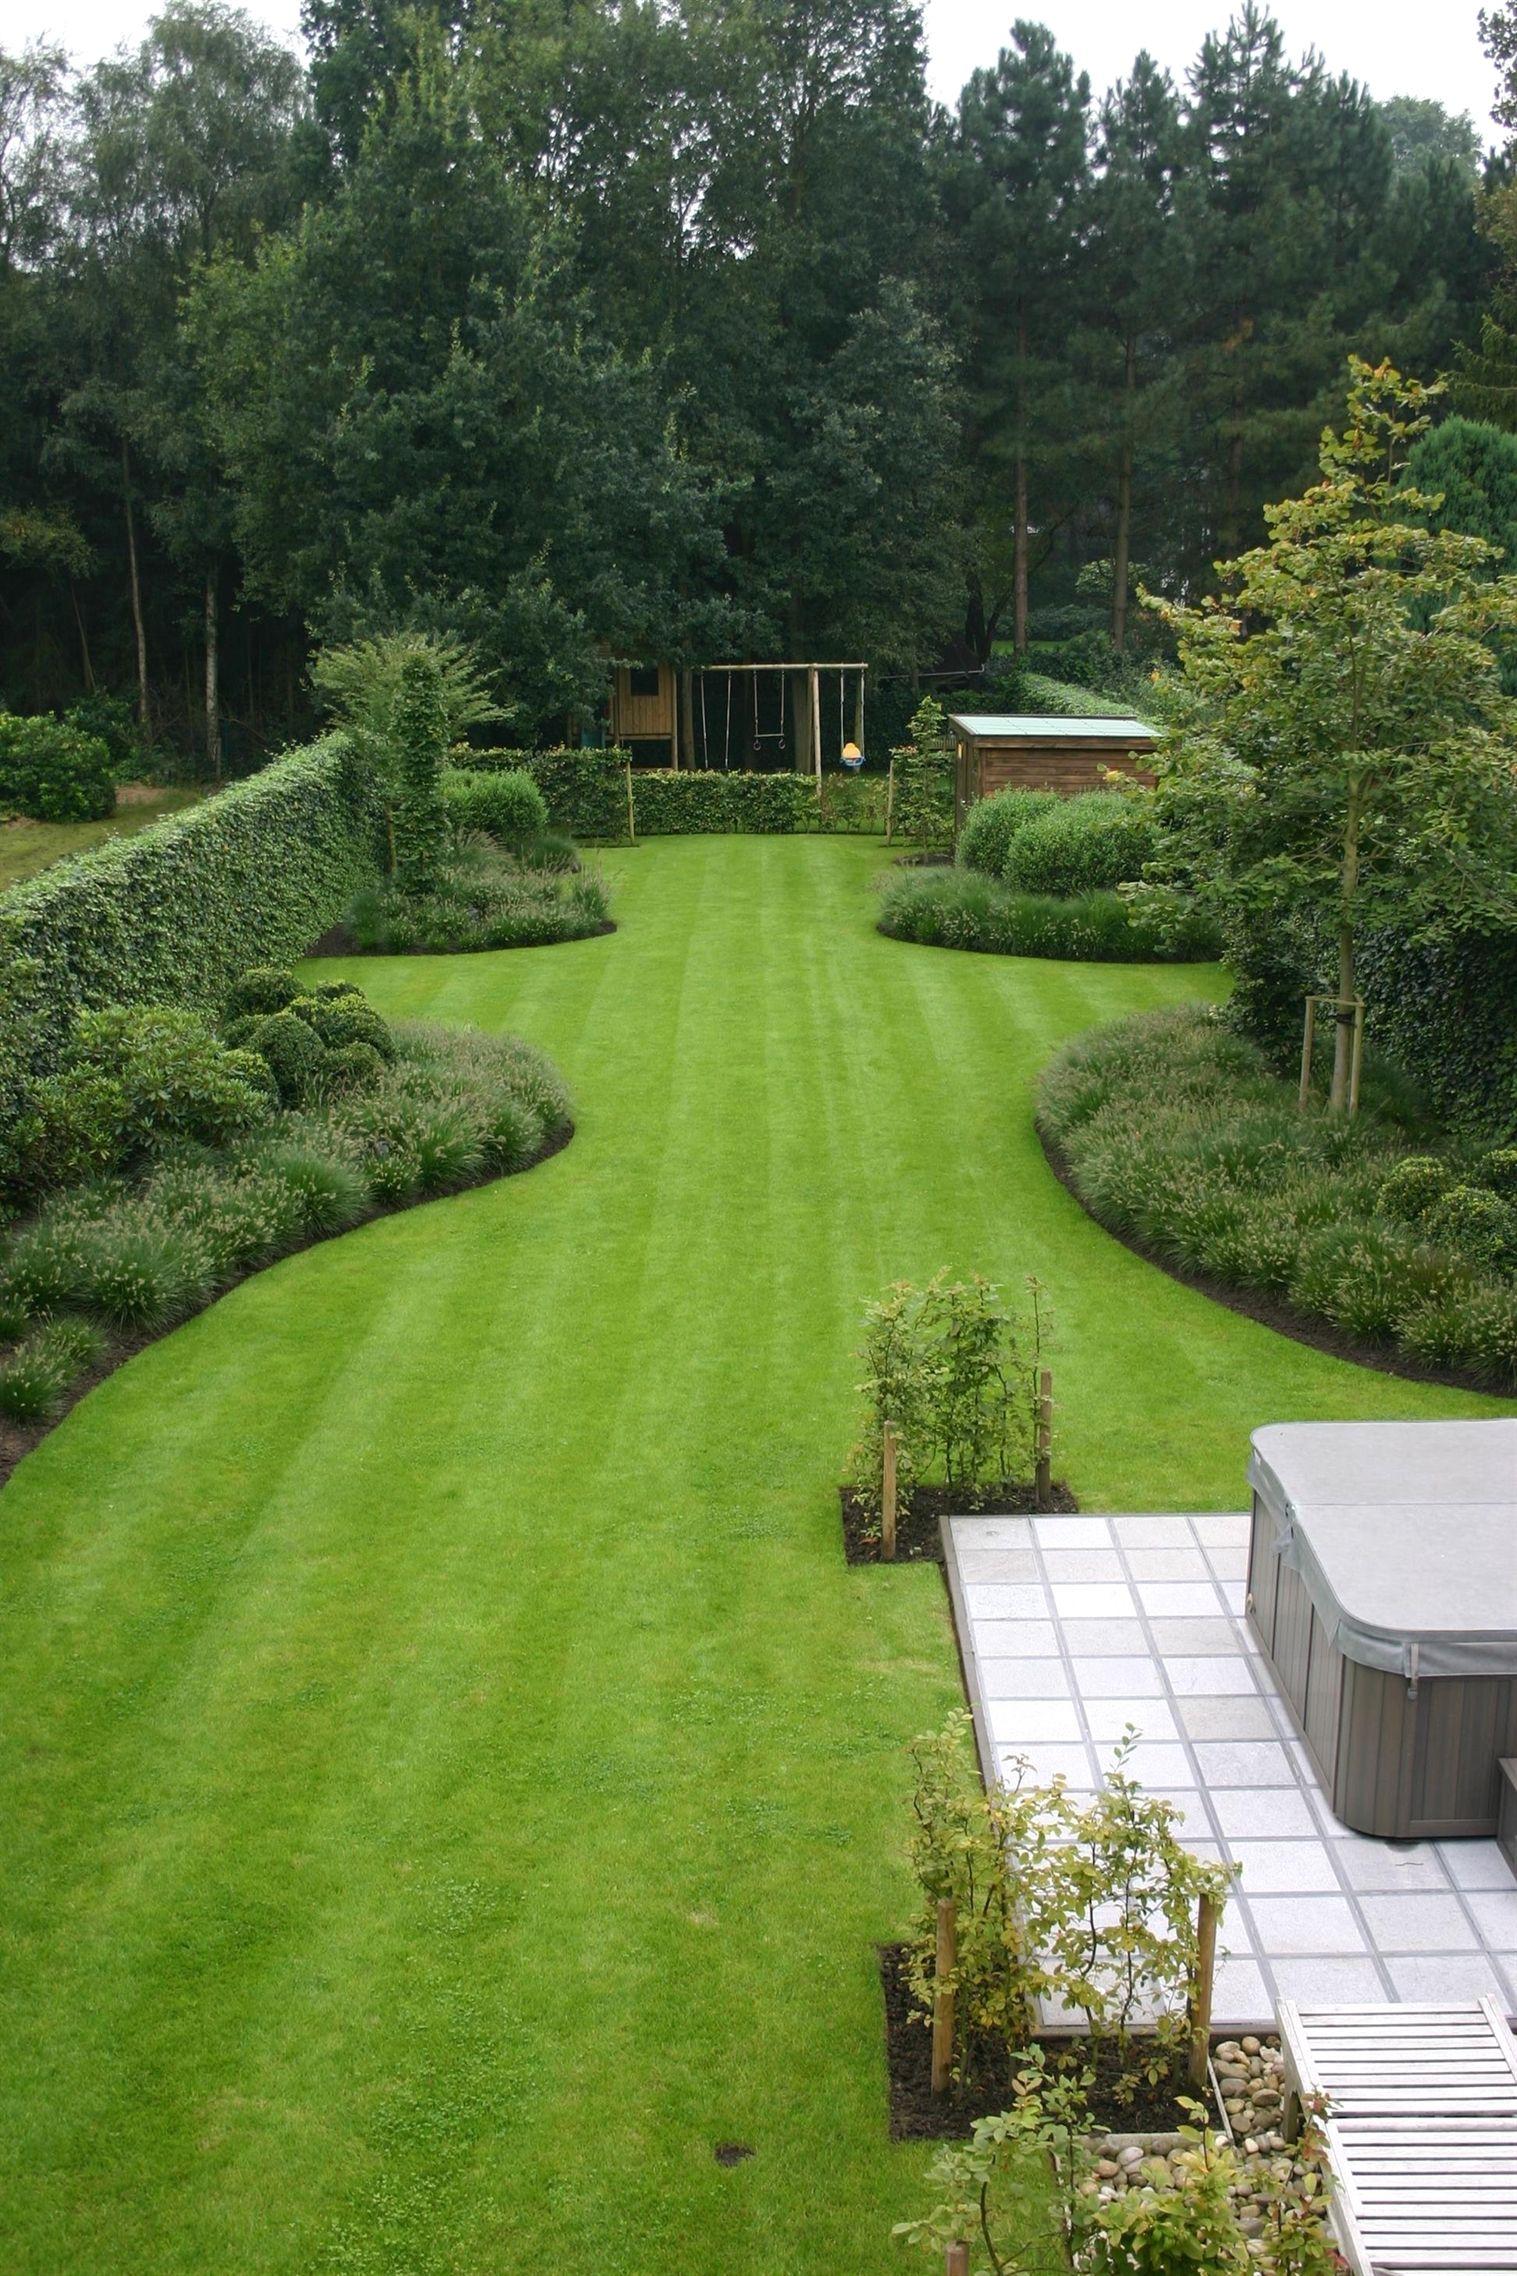 Landscaping Ideas #Landscapingphotography #Landscapingfrontyard #Landscapingideas